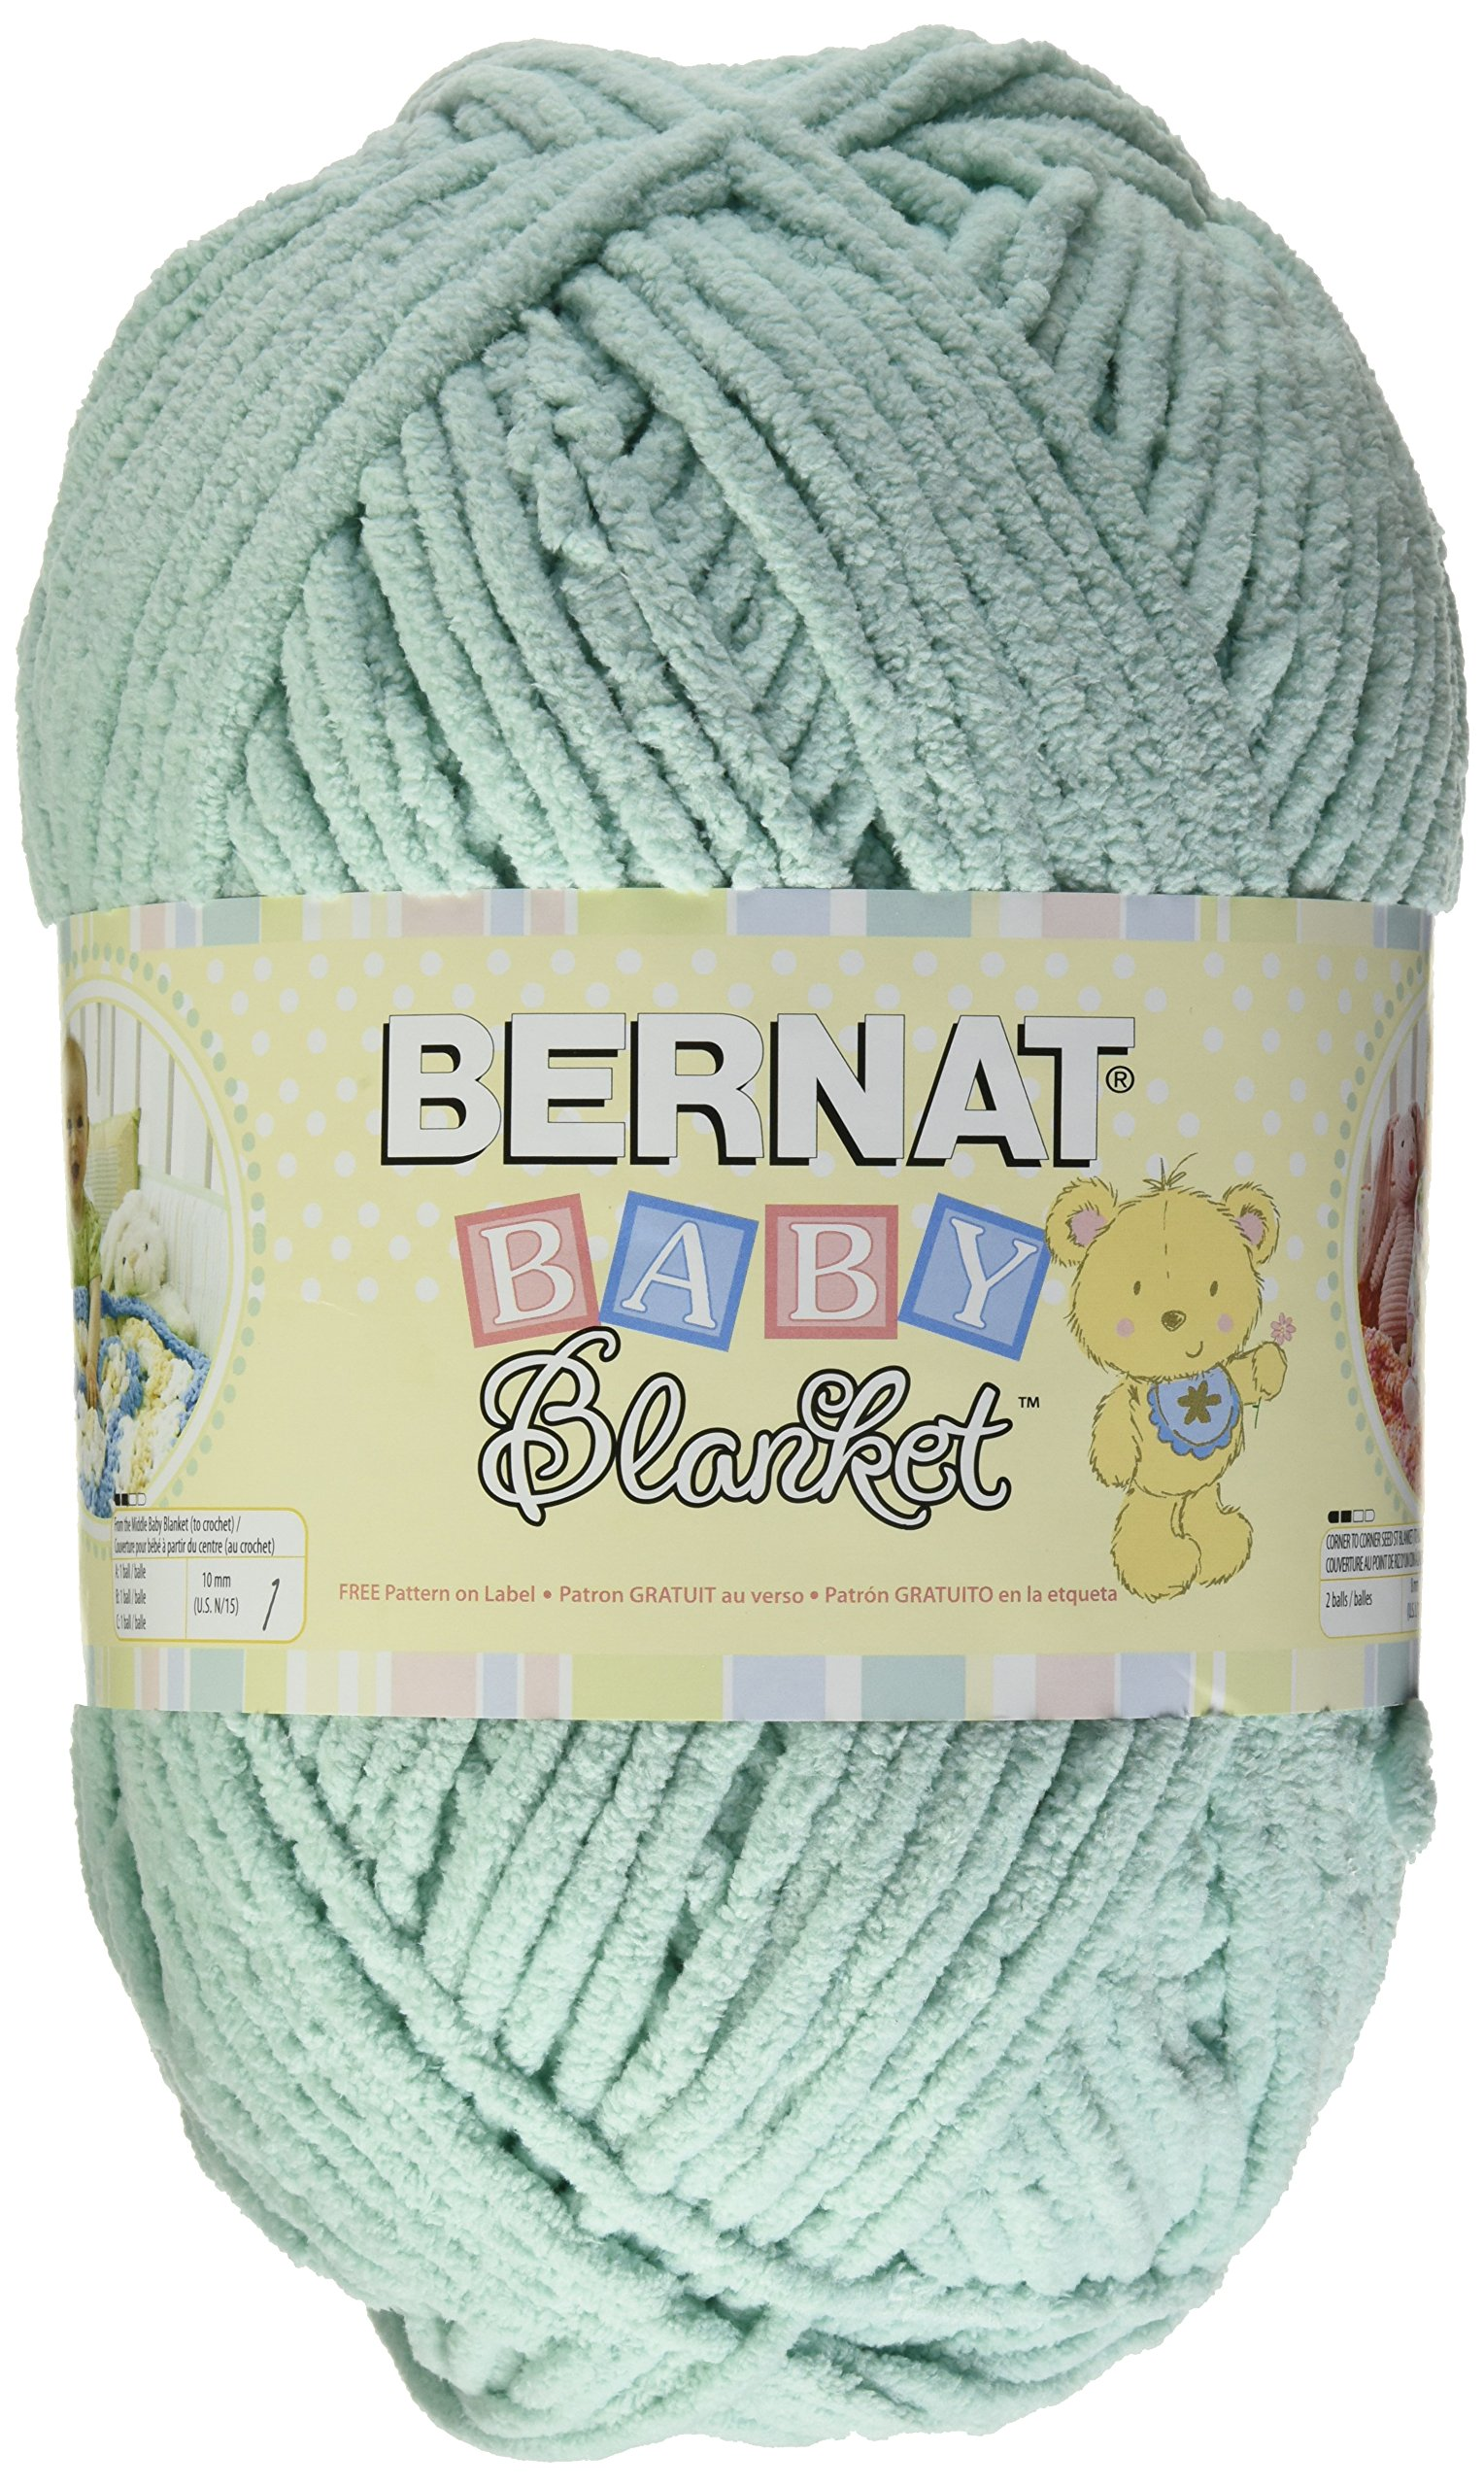 Cheap Baby Bernat Yarn Find Baby Bernat Yarn Deals On Line At